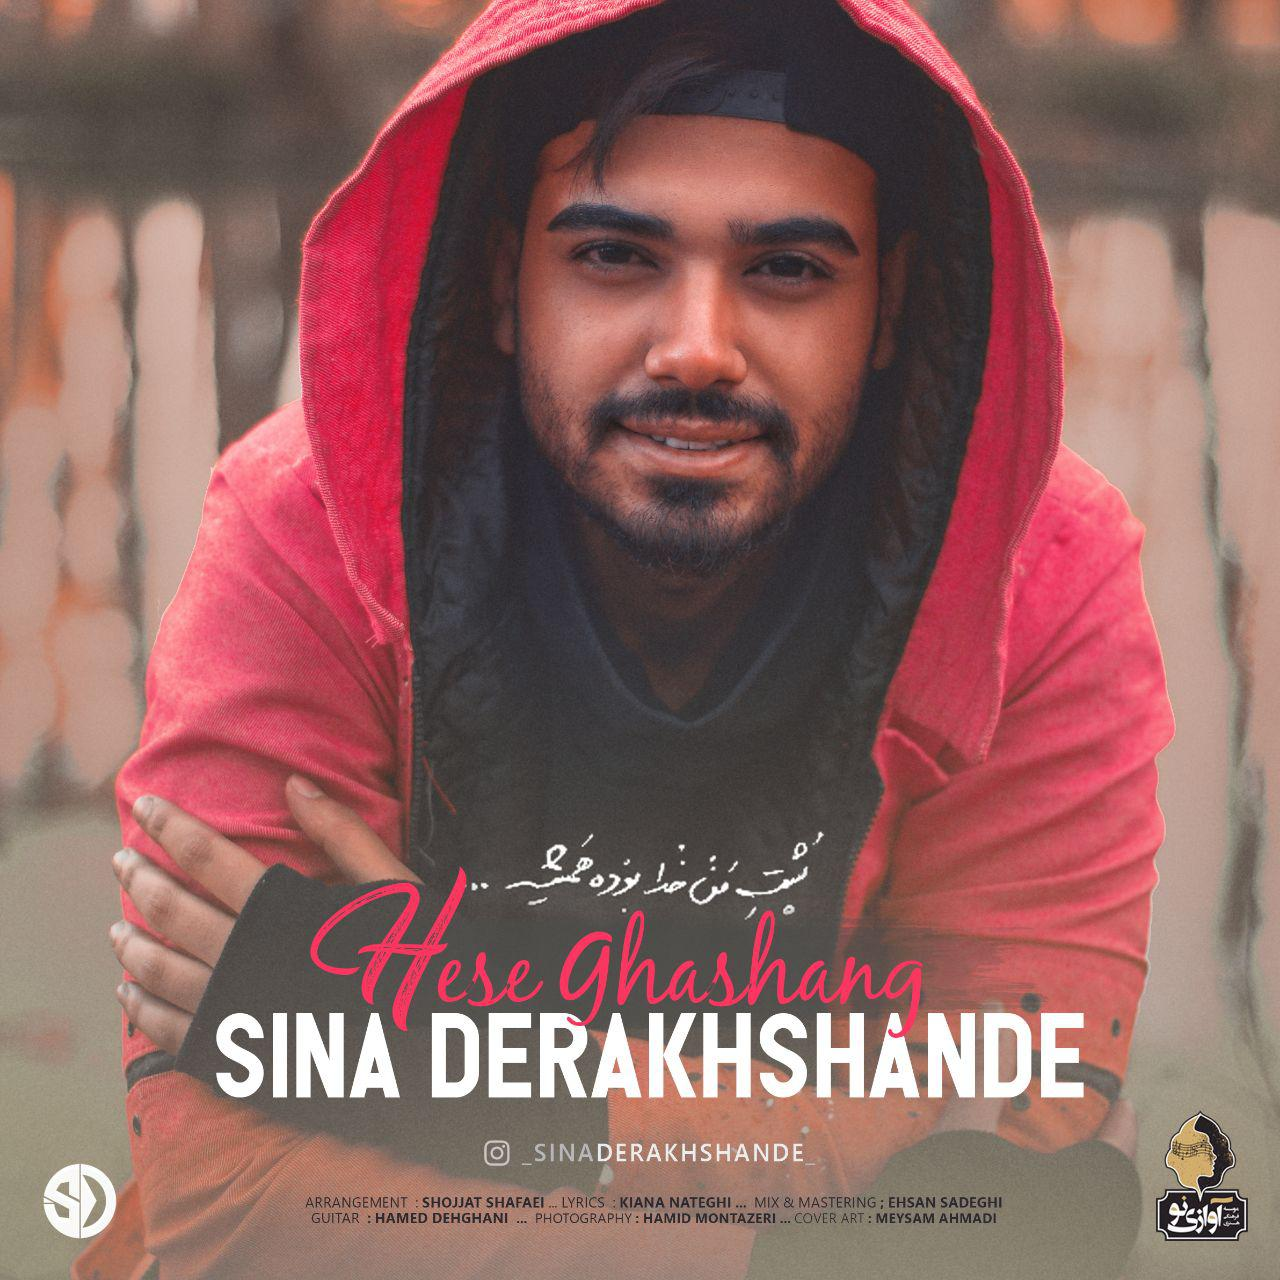 Sina Derakhshande – Hesse Ghashang